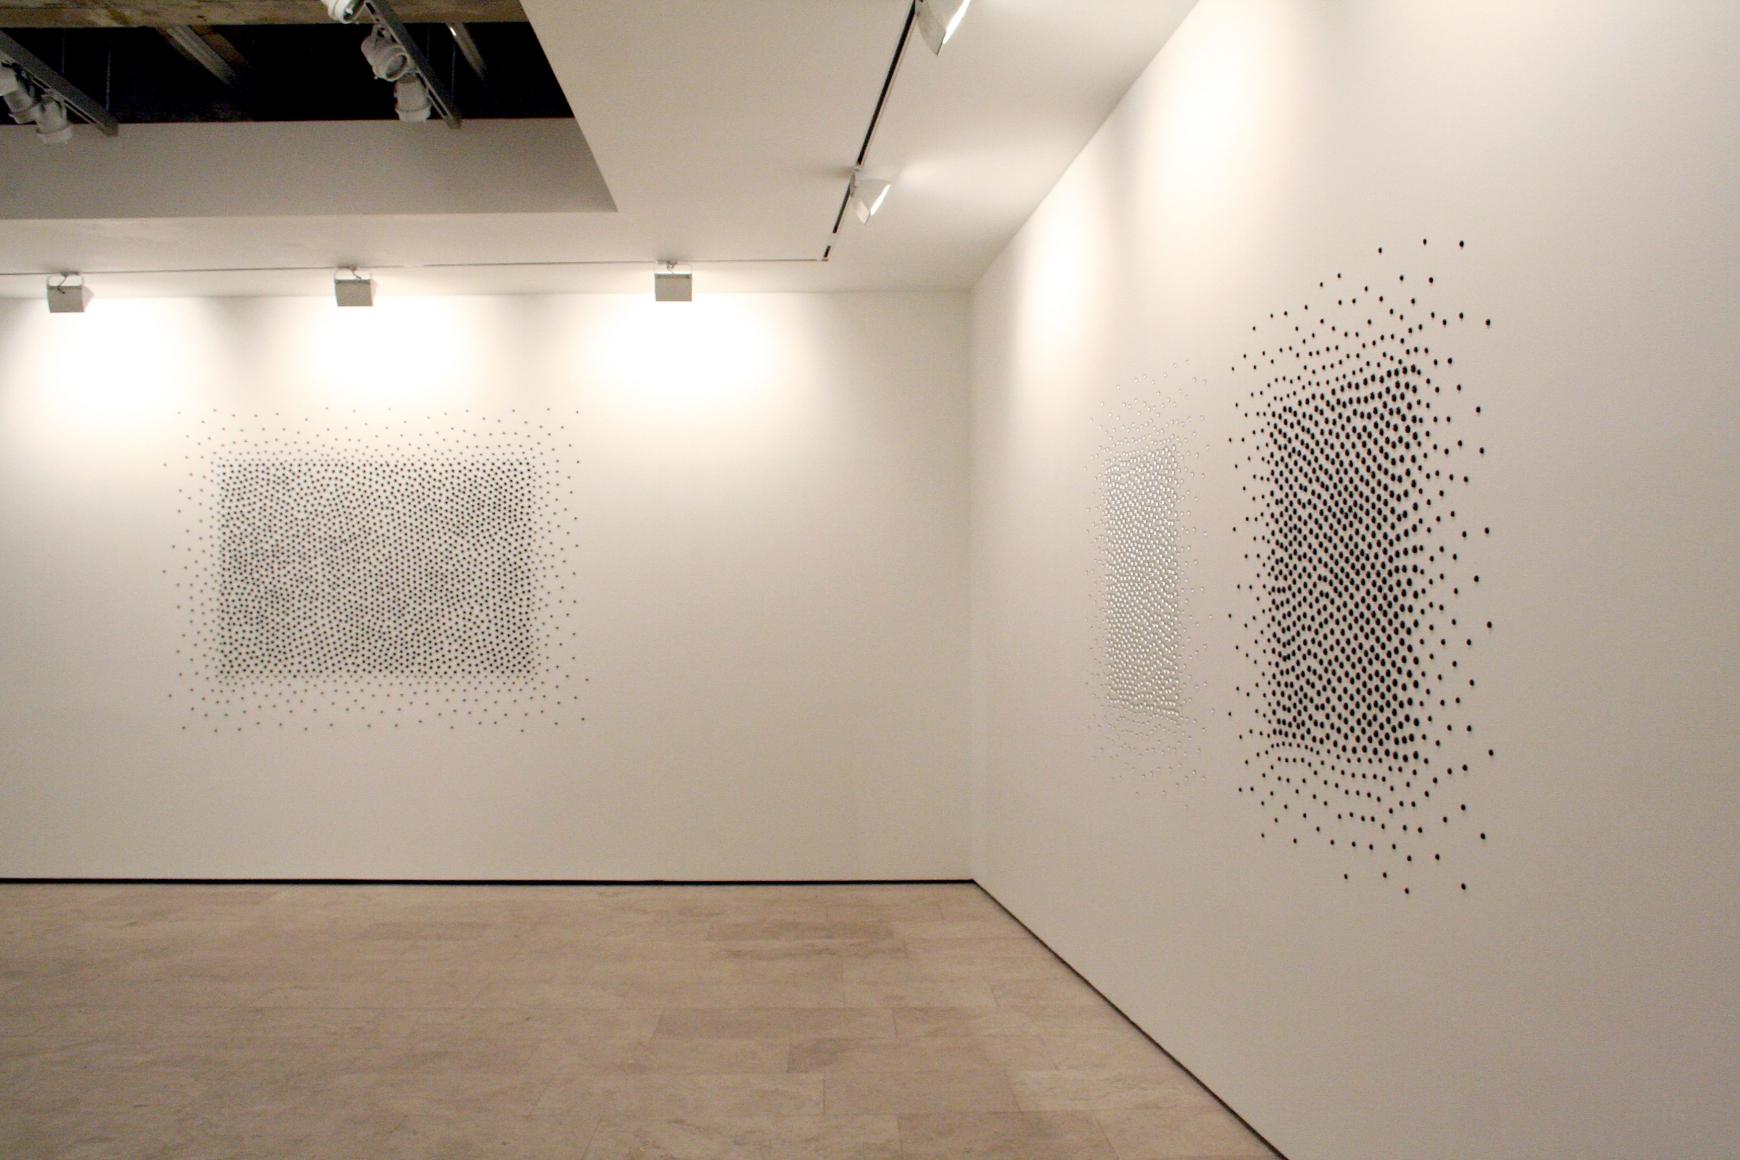 View 1 of TERESITA FERNANDEZ Installation at Lehmann Maupin Gallery.